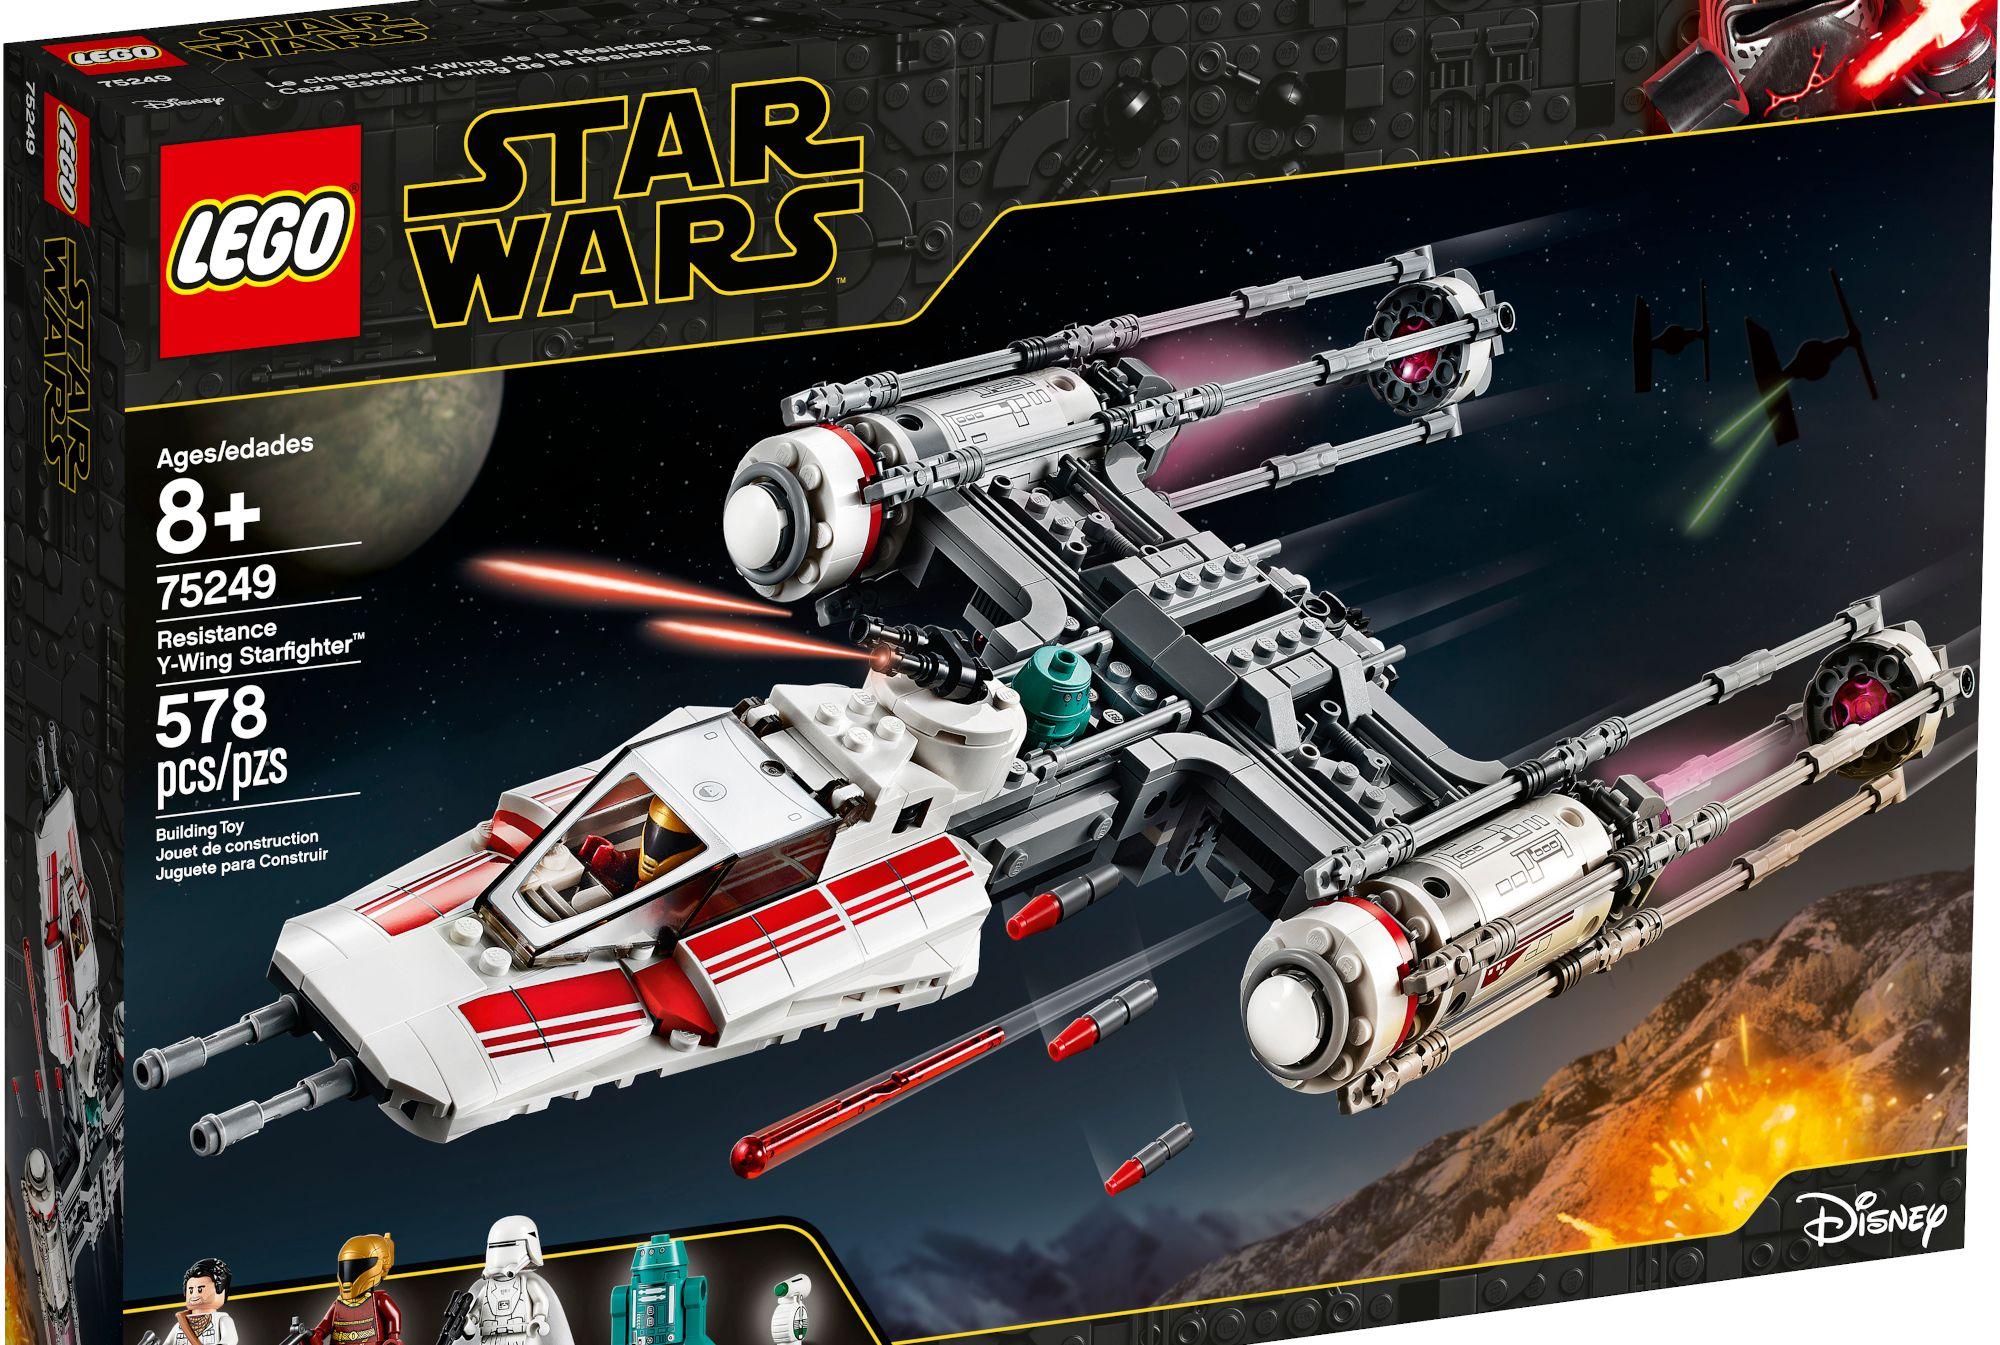 Lego Darth Vader Head x 10 White Pupils Medium Stone Grey for Minifigure